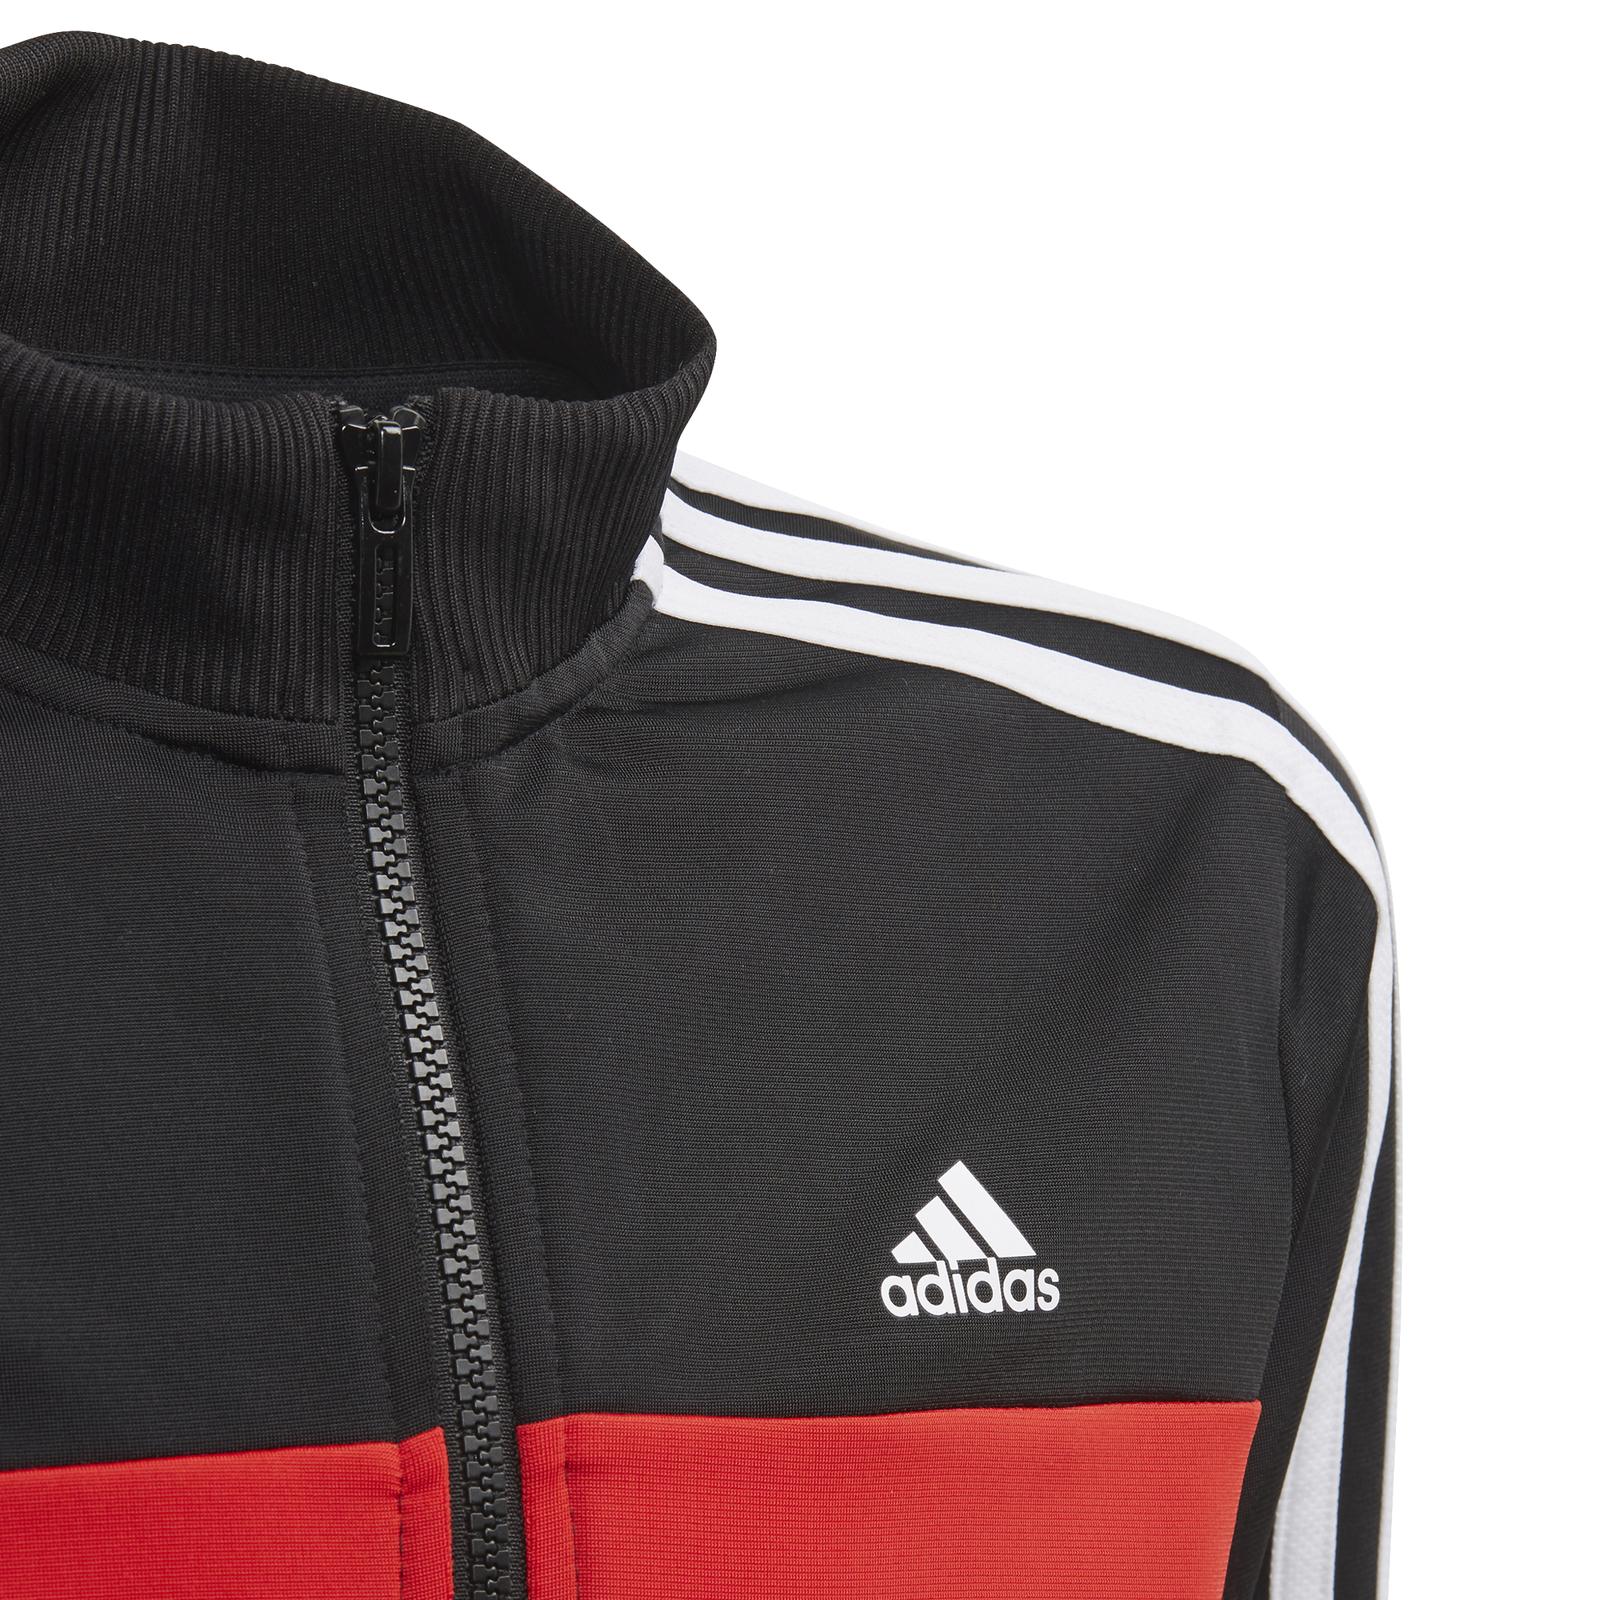 adidas Performance Kinder Sport-Trainingsanzug Tiberio Tracksuit schwarz rot